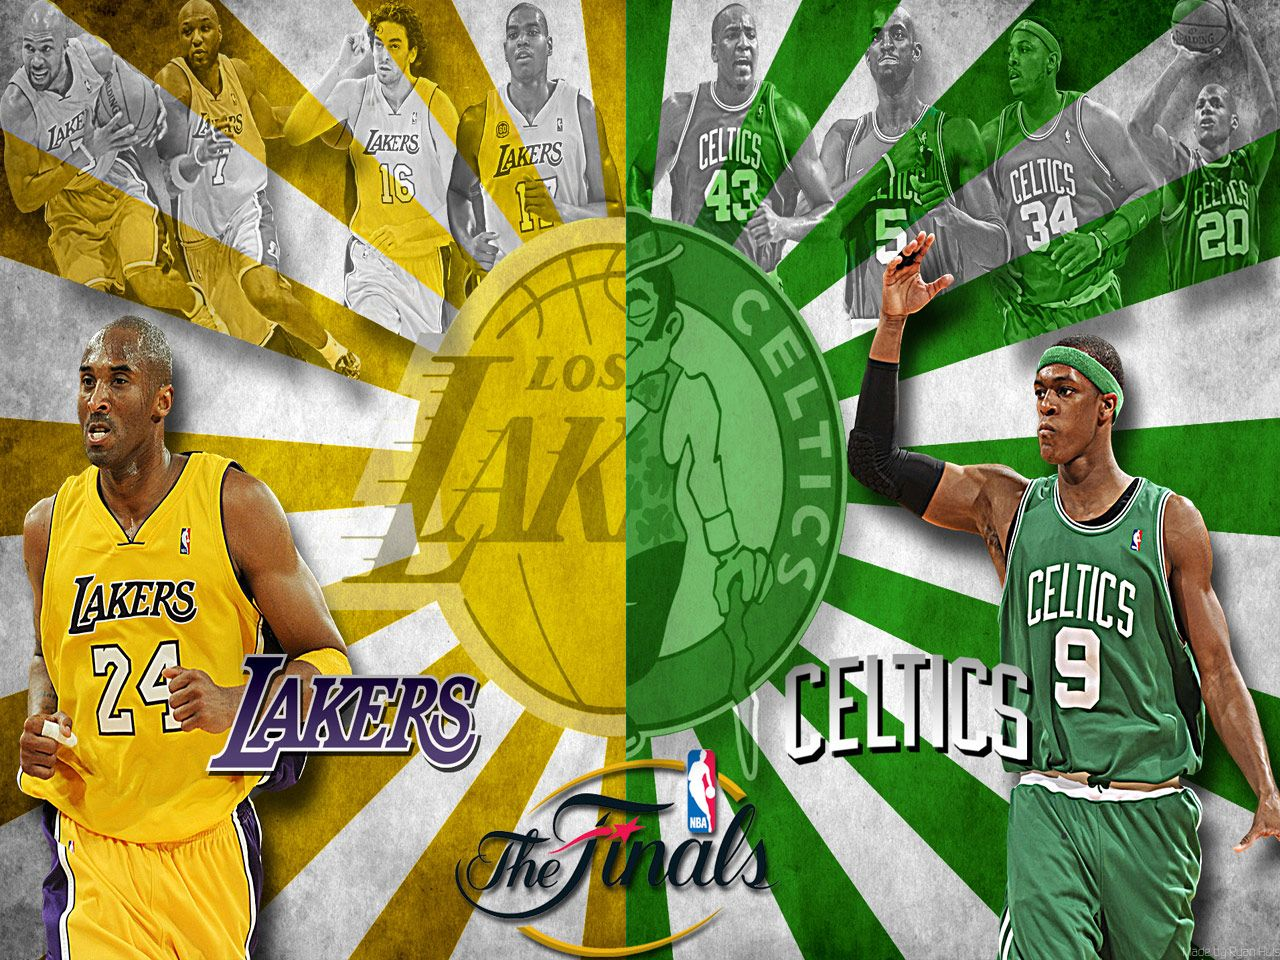 Nba Nba Finals 2010 Celtics Vs Lakers Photo Lakers Vs Lakers Vs Celtics Nba Finals